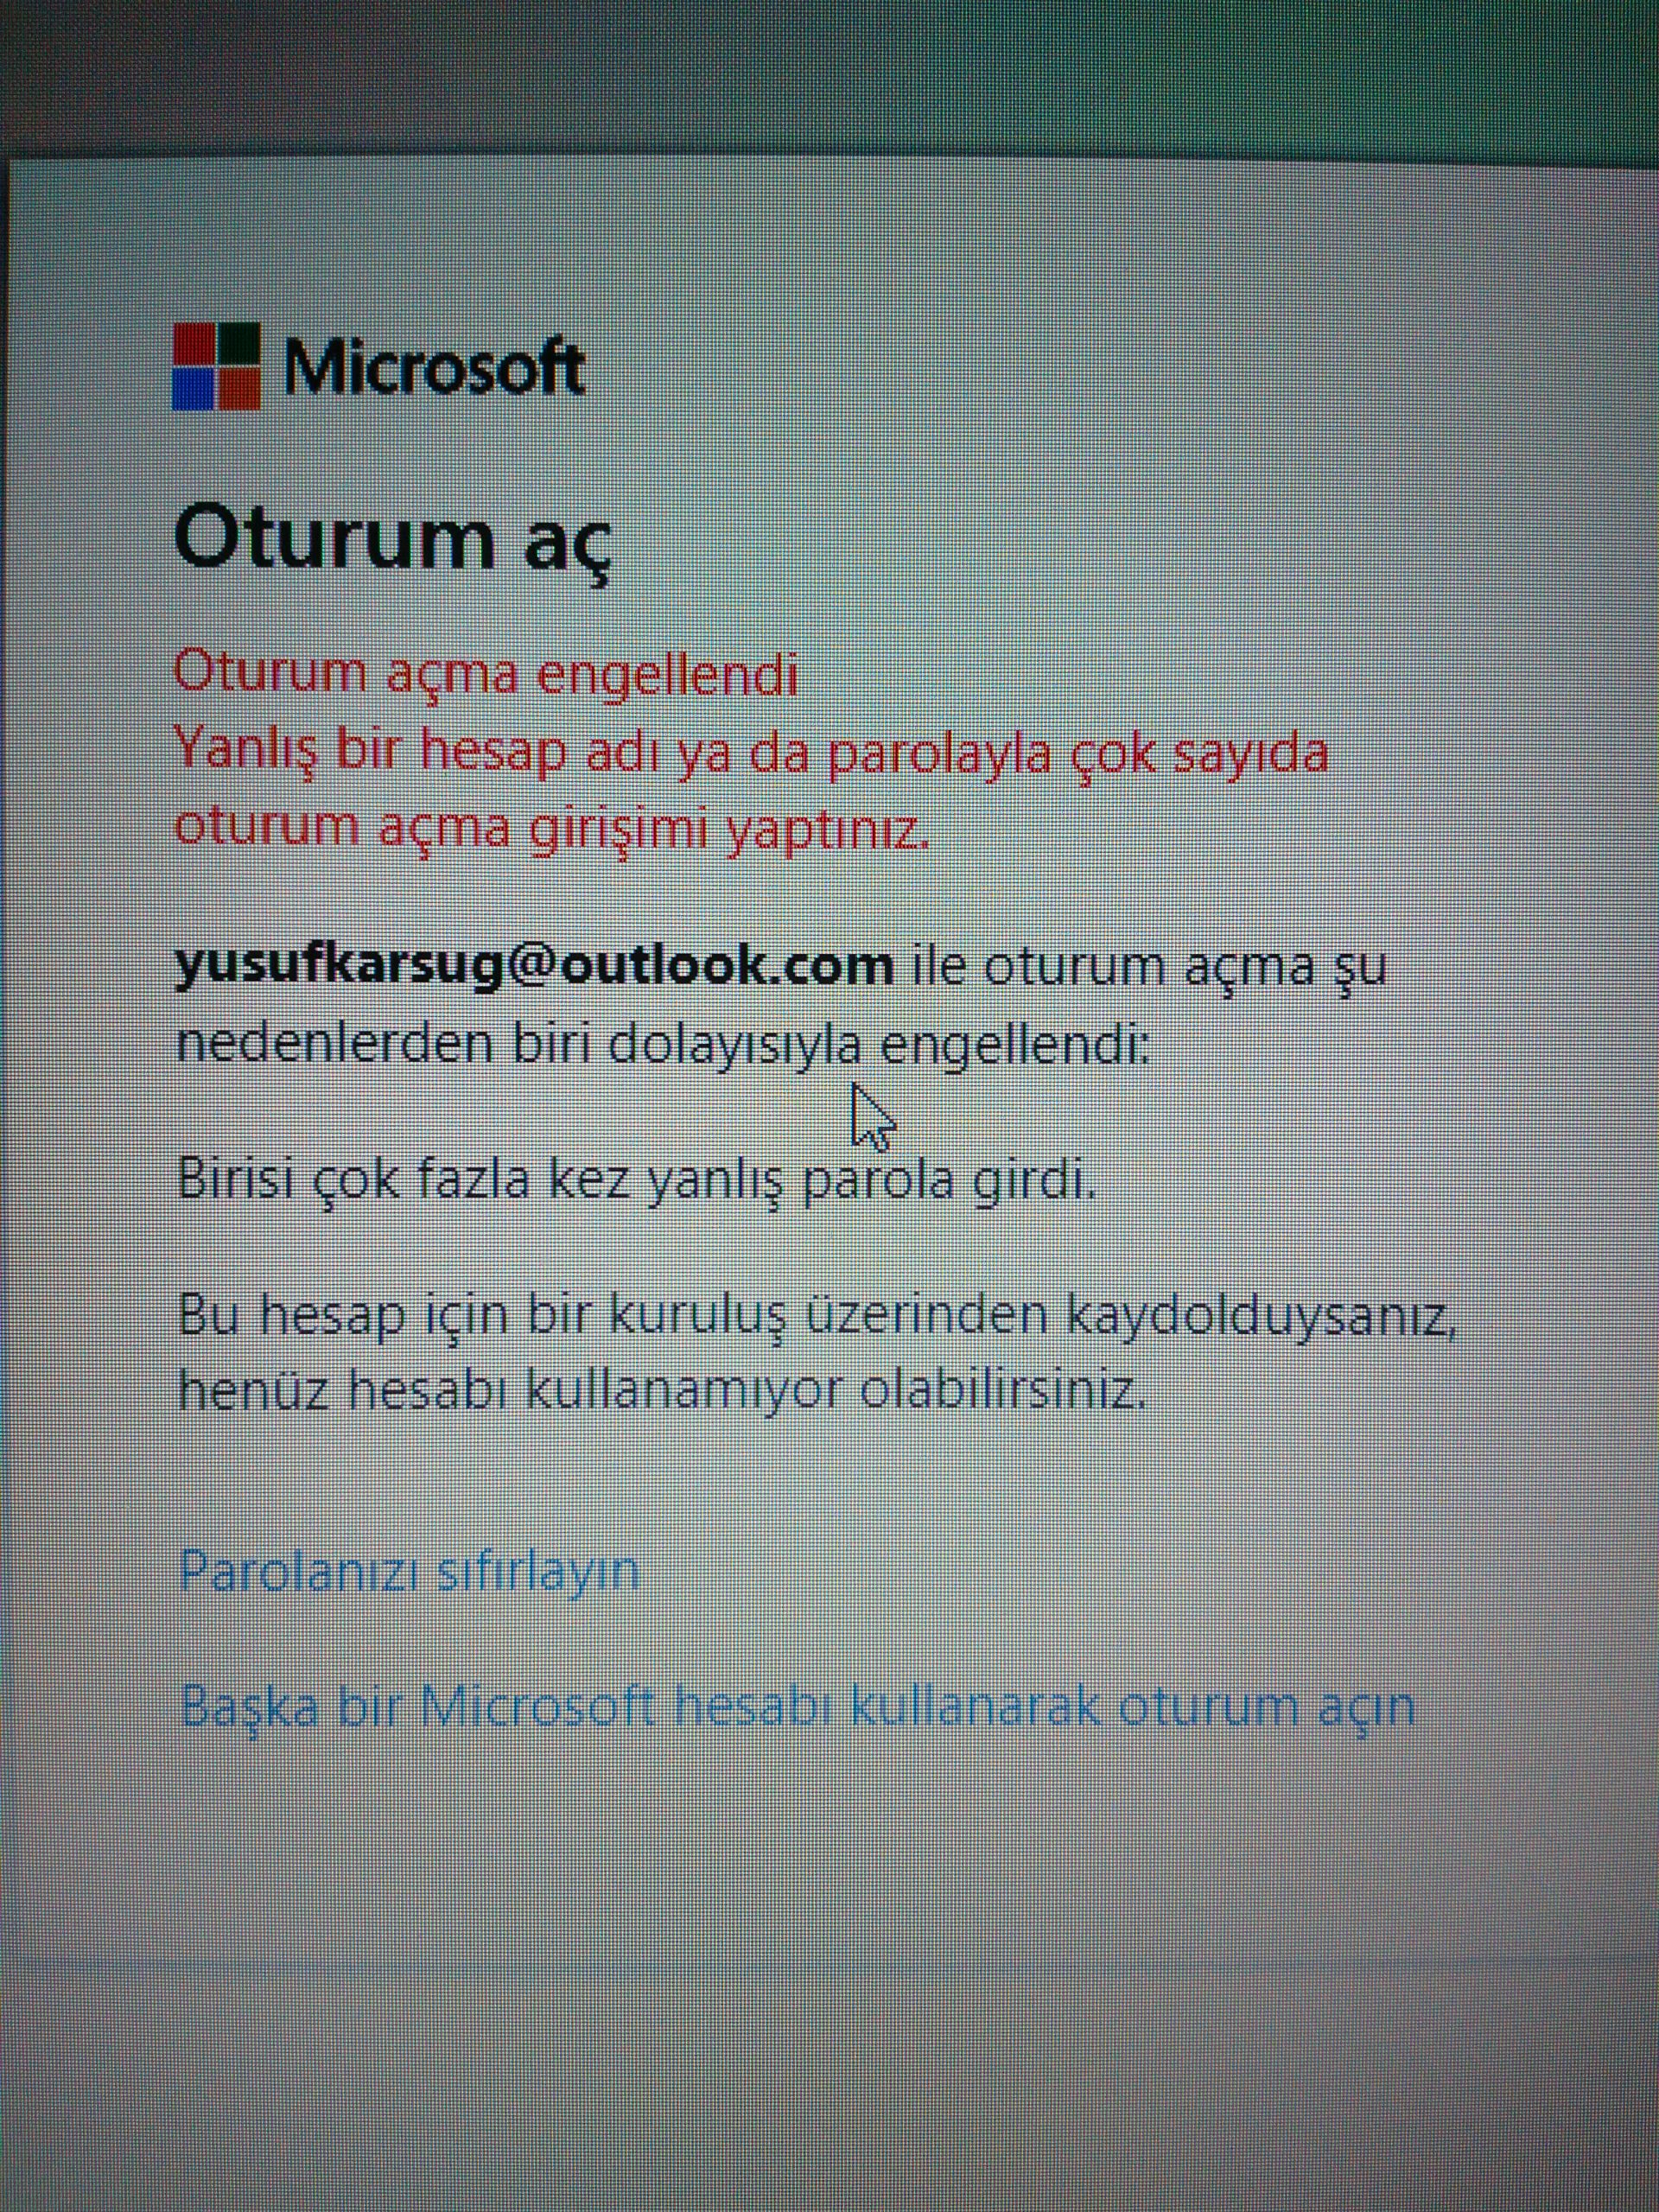 Outlook oturum açma engellendi!